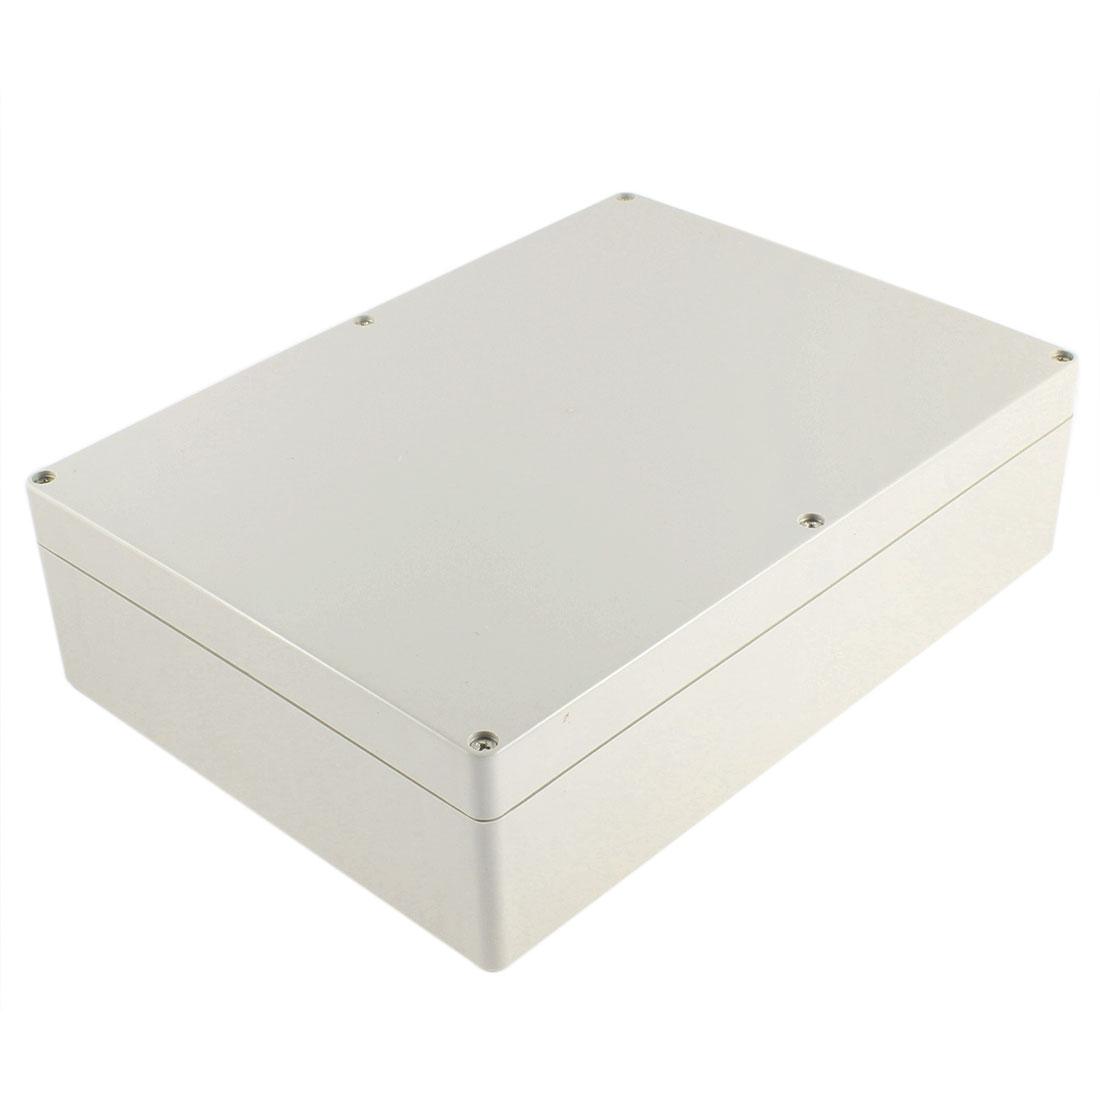 Plastic Electronic Project Box Enclosure Case 290 x 210 x 80mm